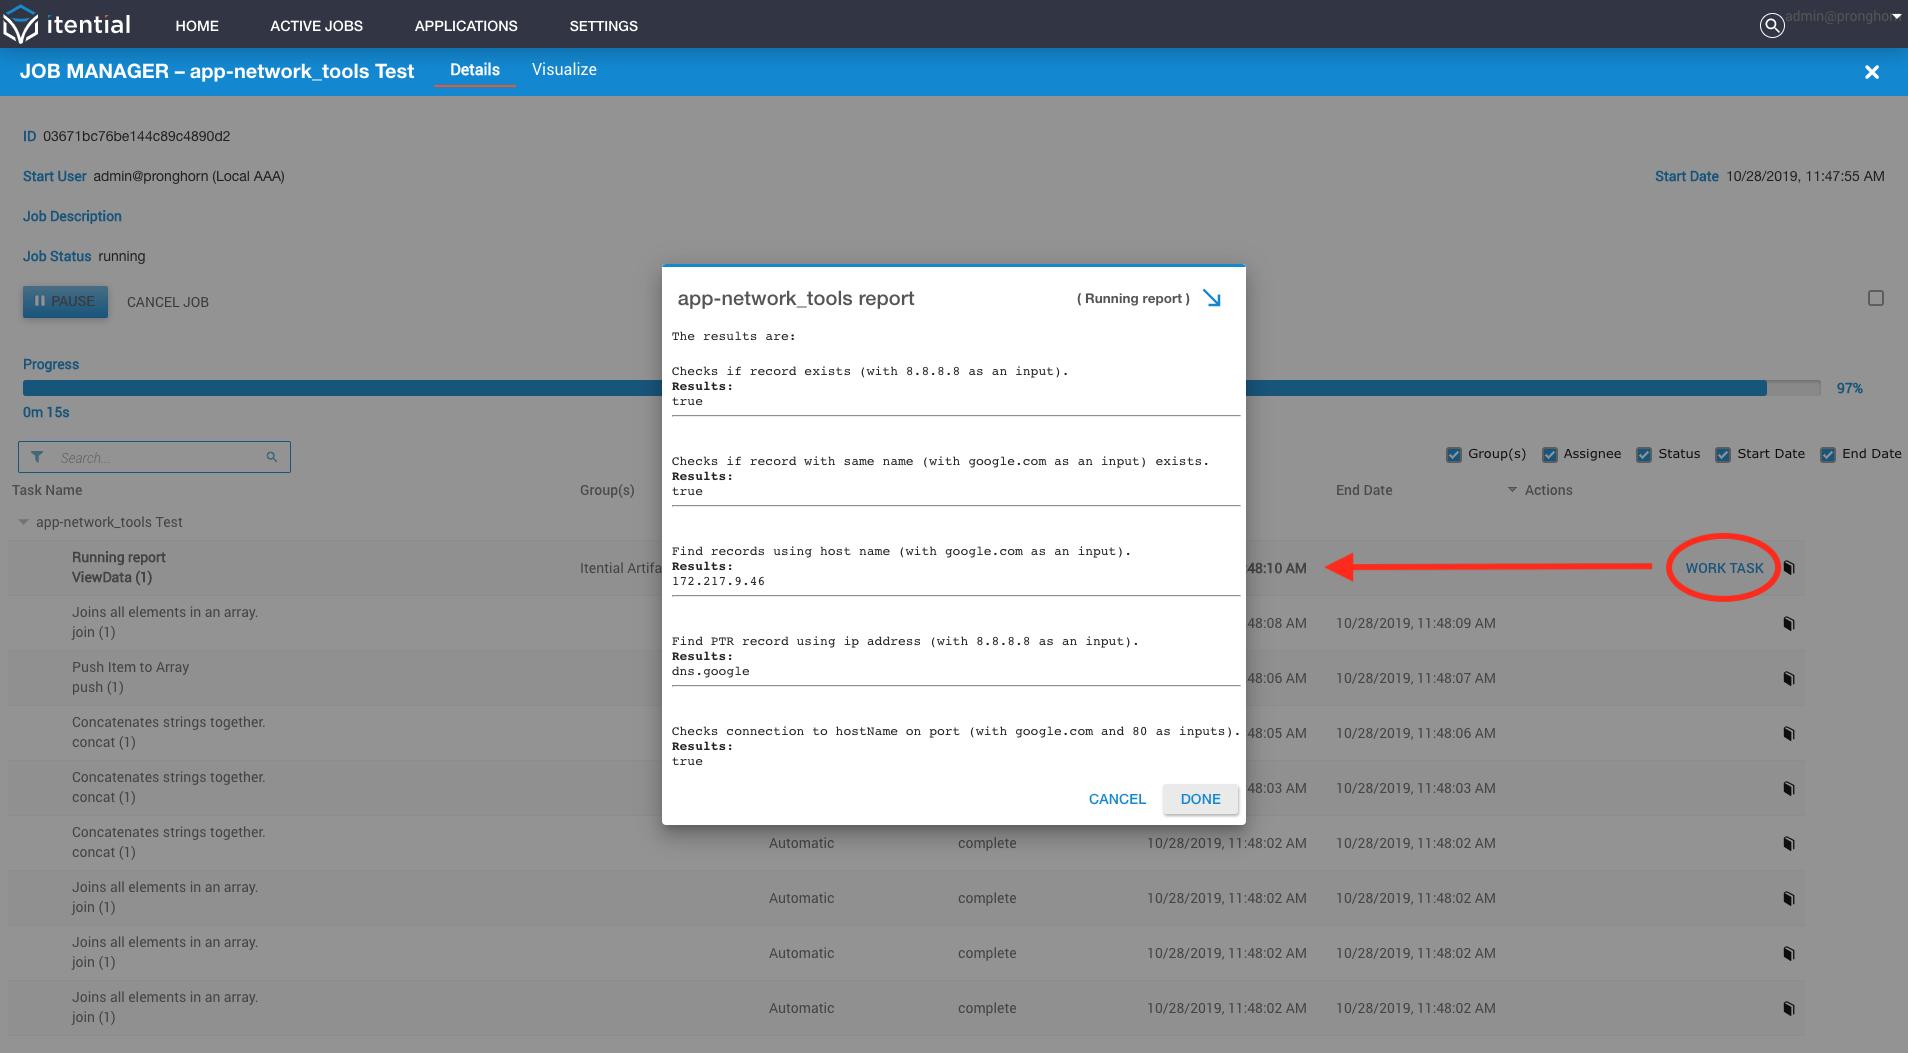 app-network_tools Test workflow report